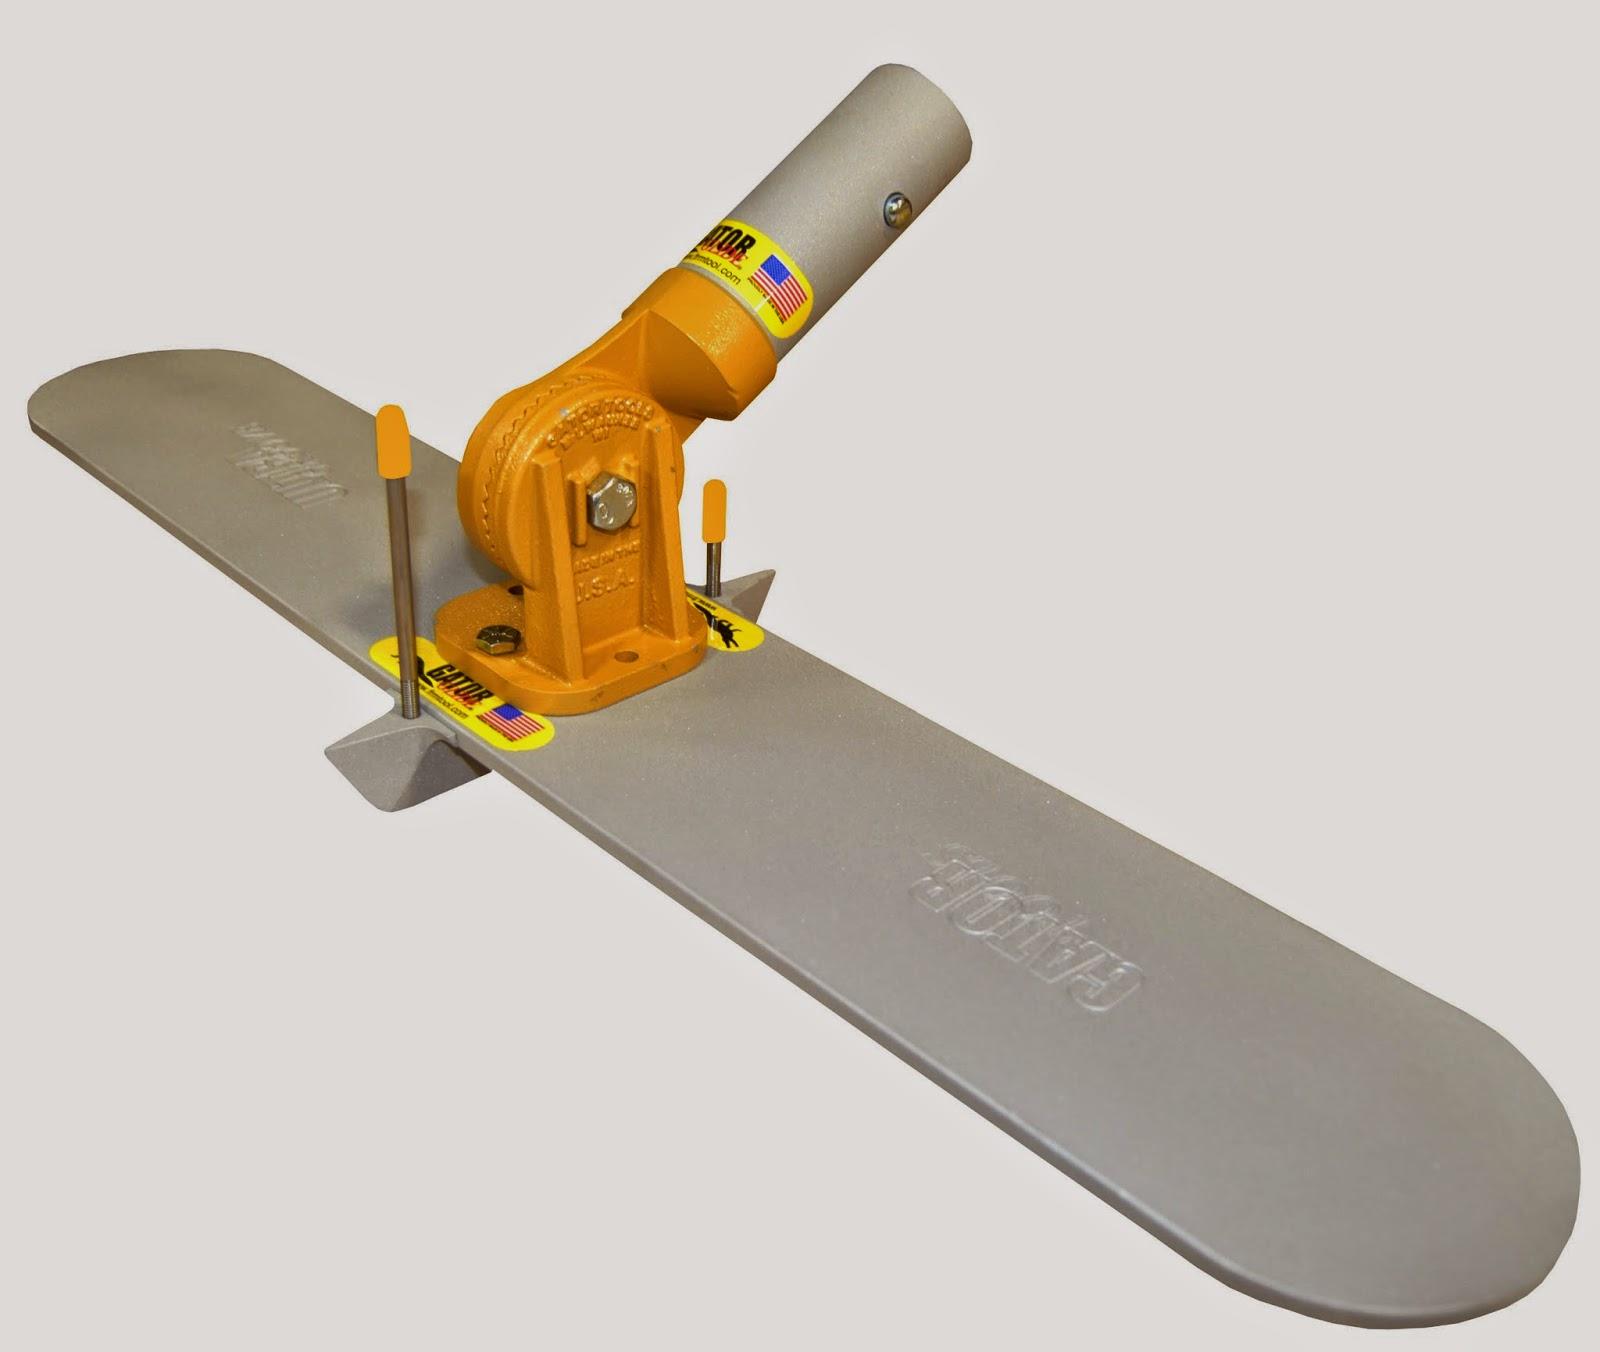 gator tool concrete tools december 2014